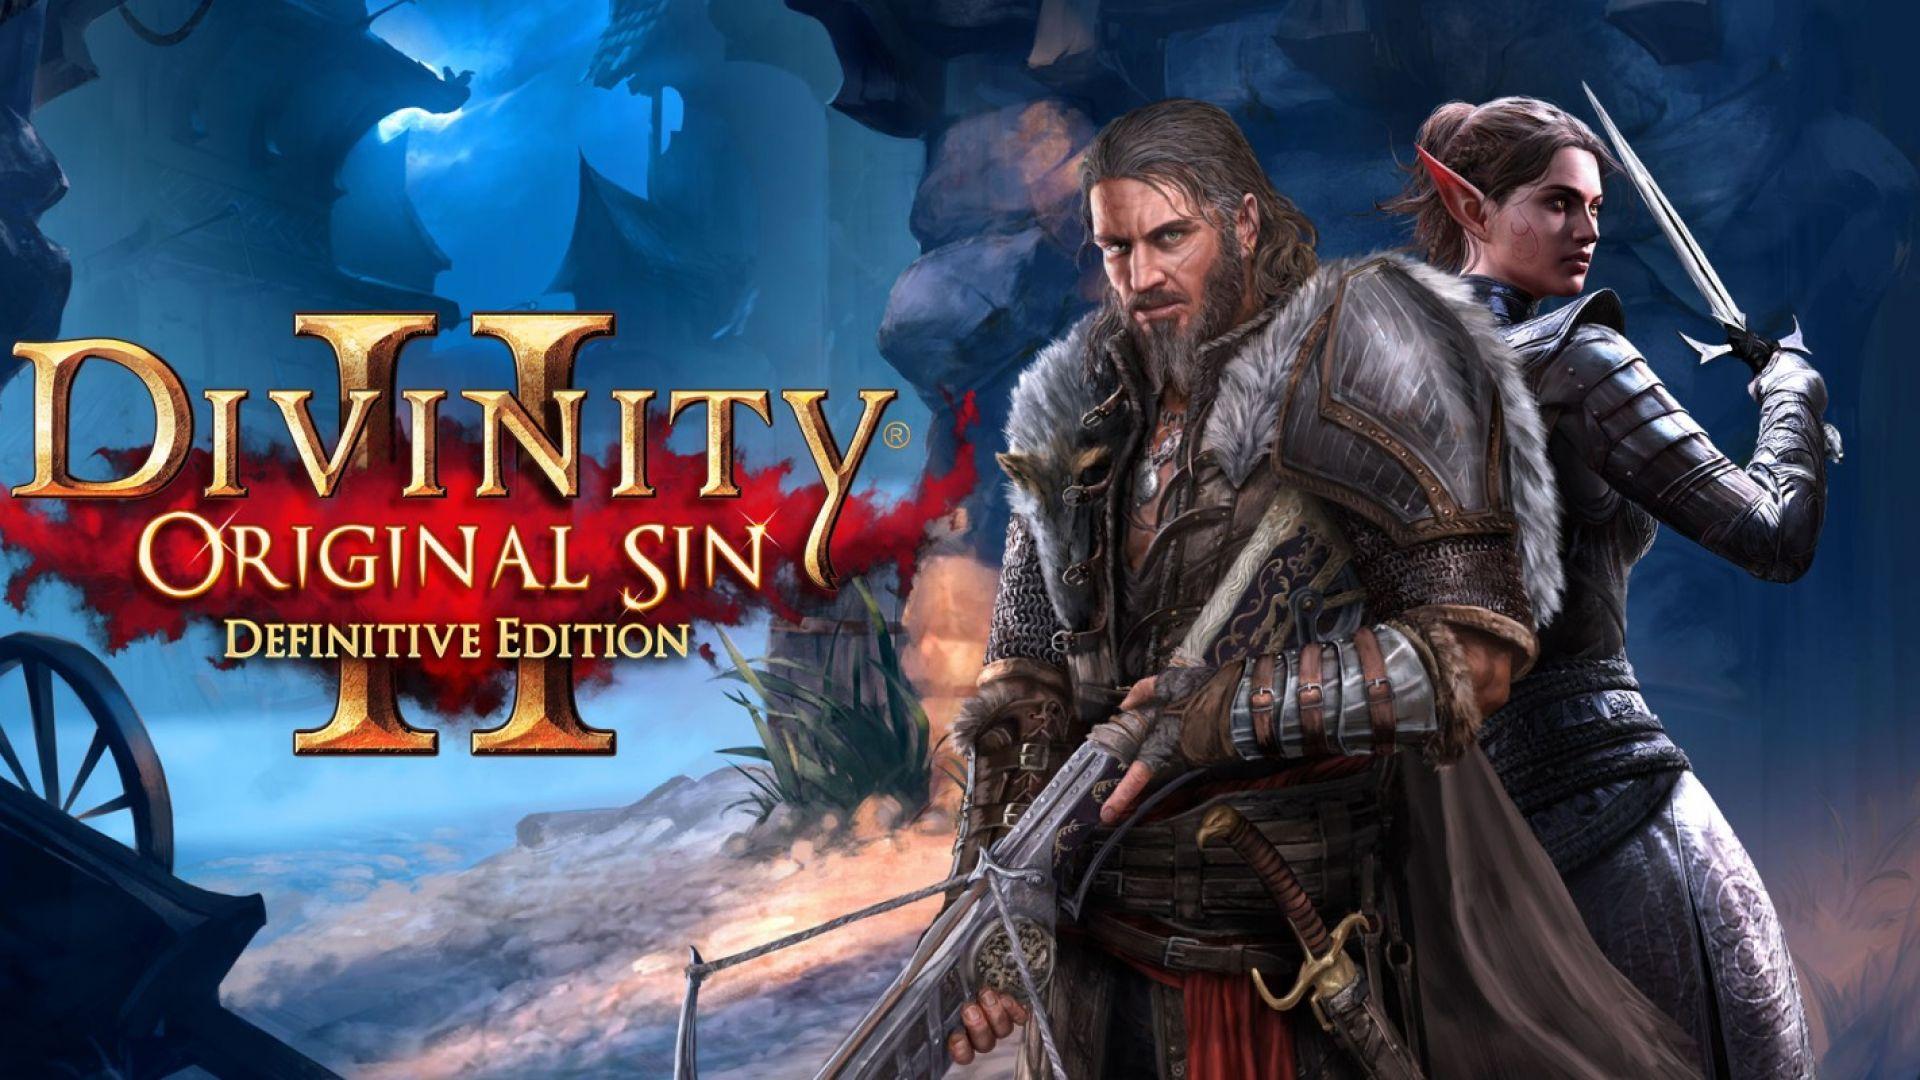 Divinity Original Sin 2: Definitive Edition